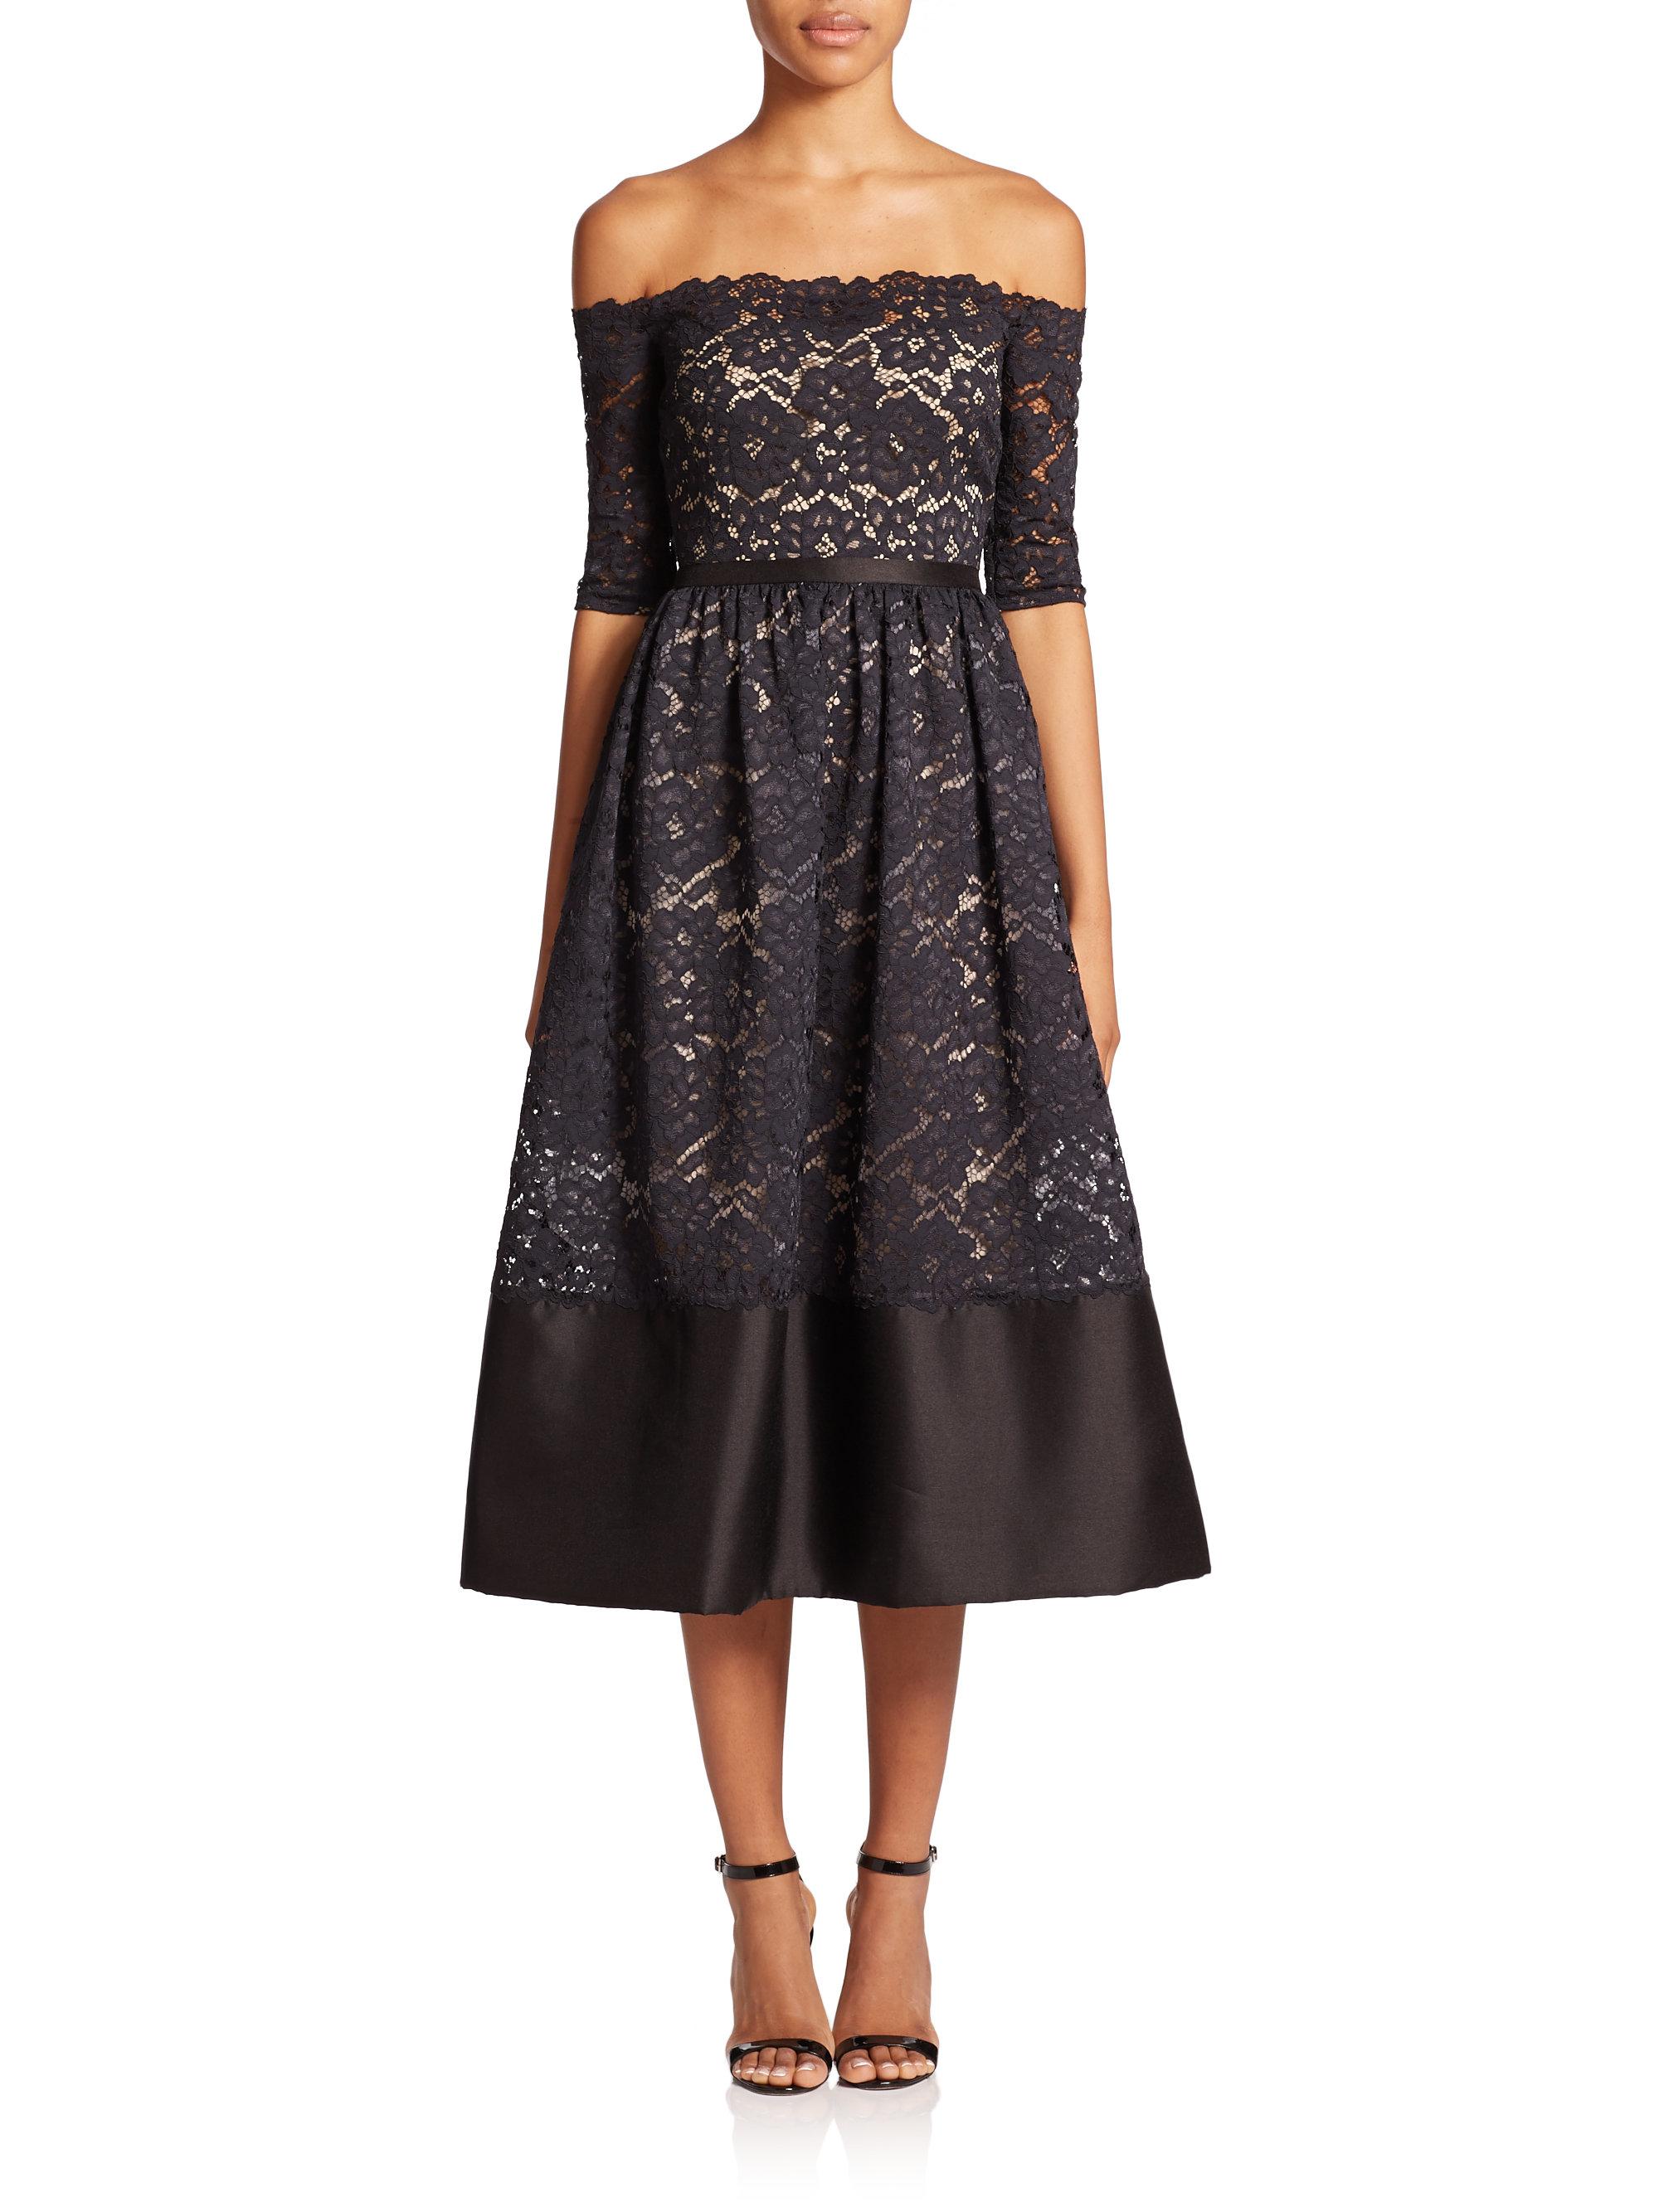 Off the shoulder midi lace dress